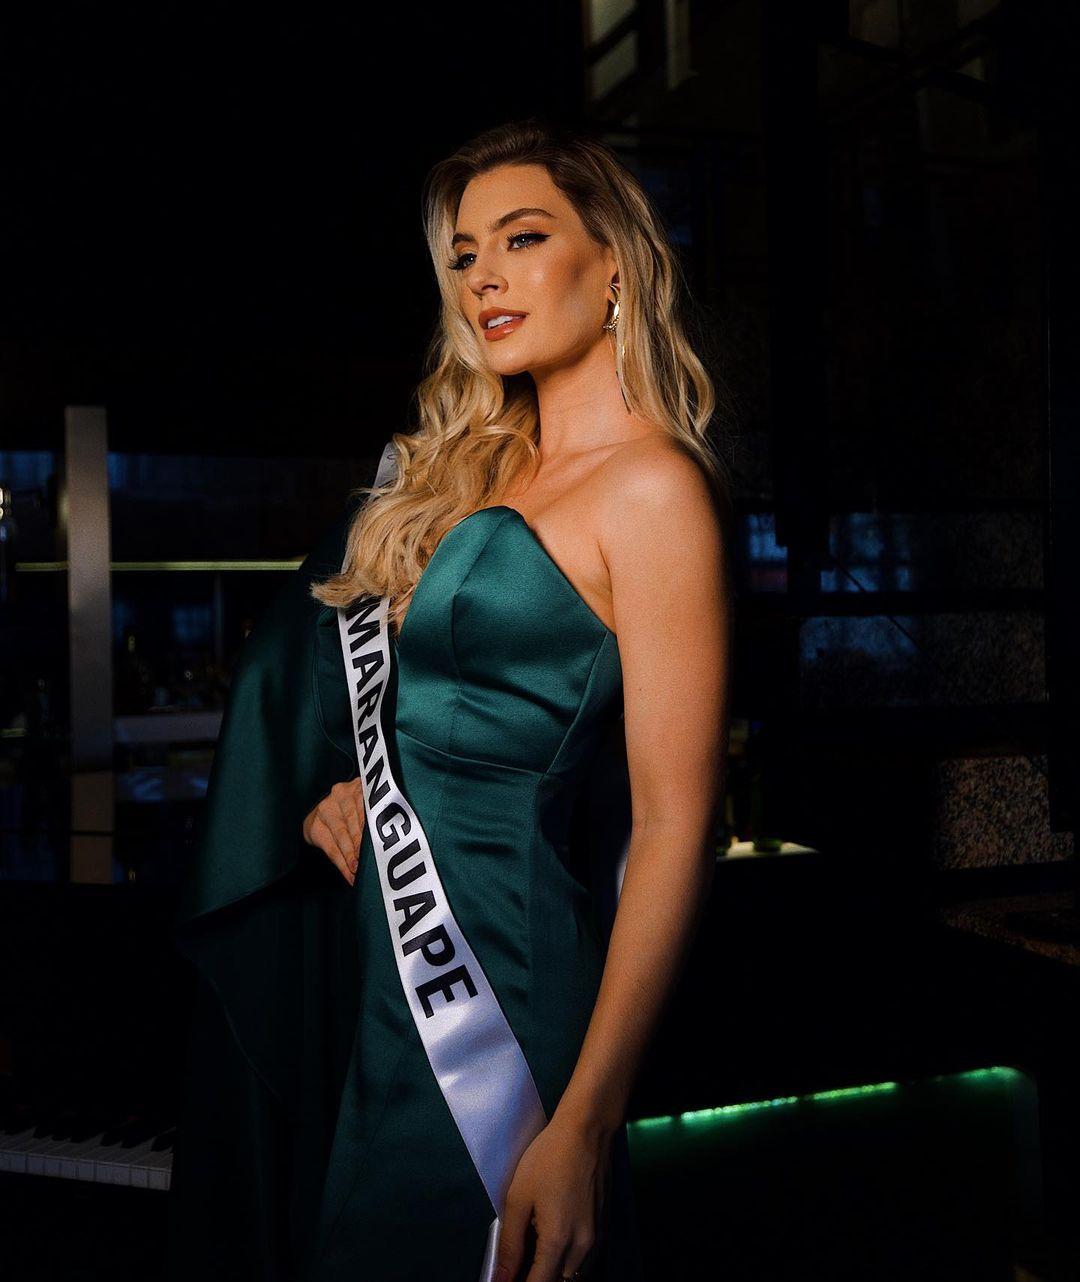 Teresa Santos é eleita Miss Universo Ceará pela segunda vez